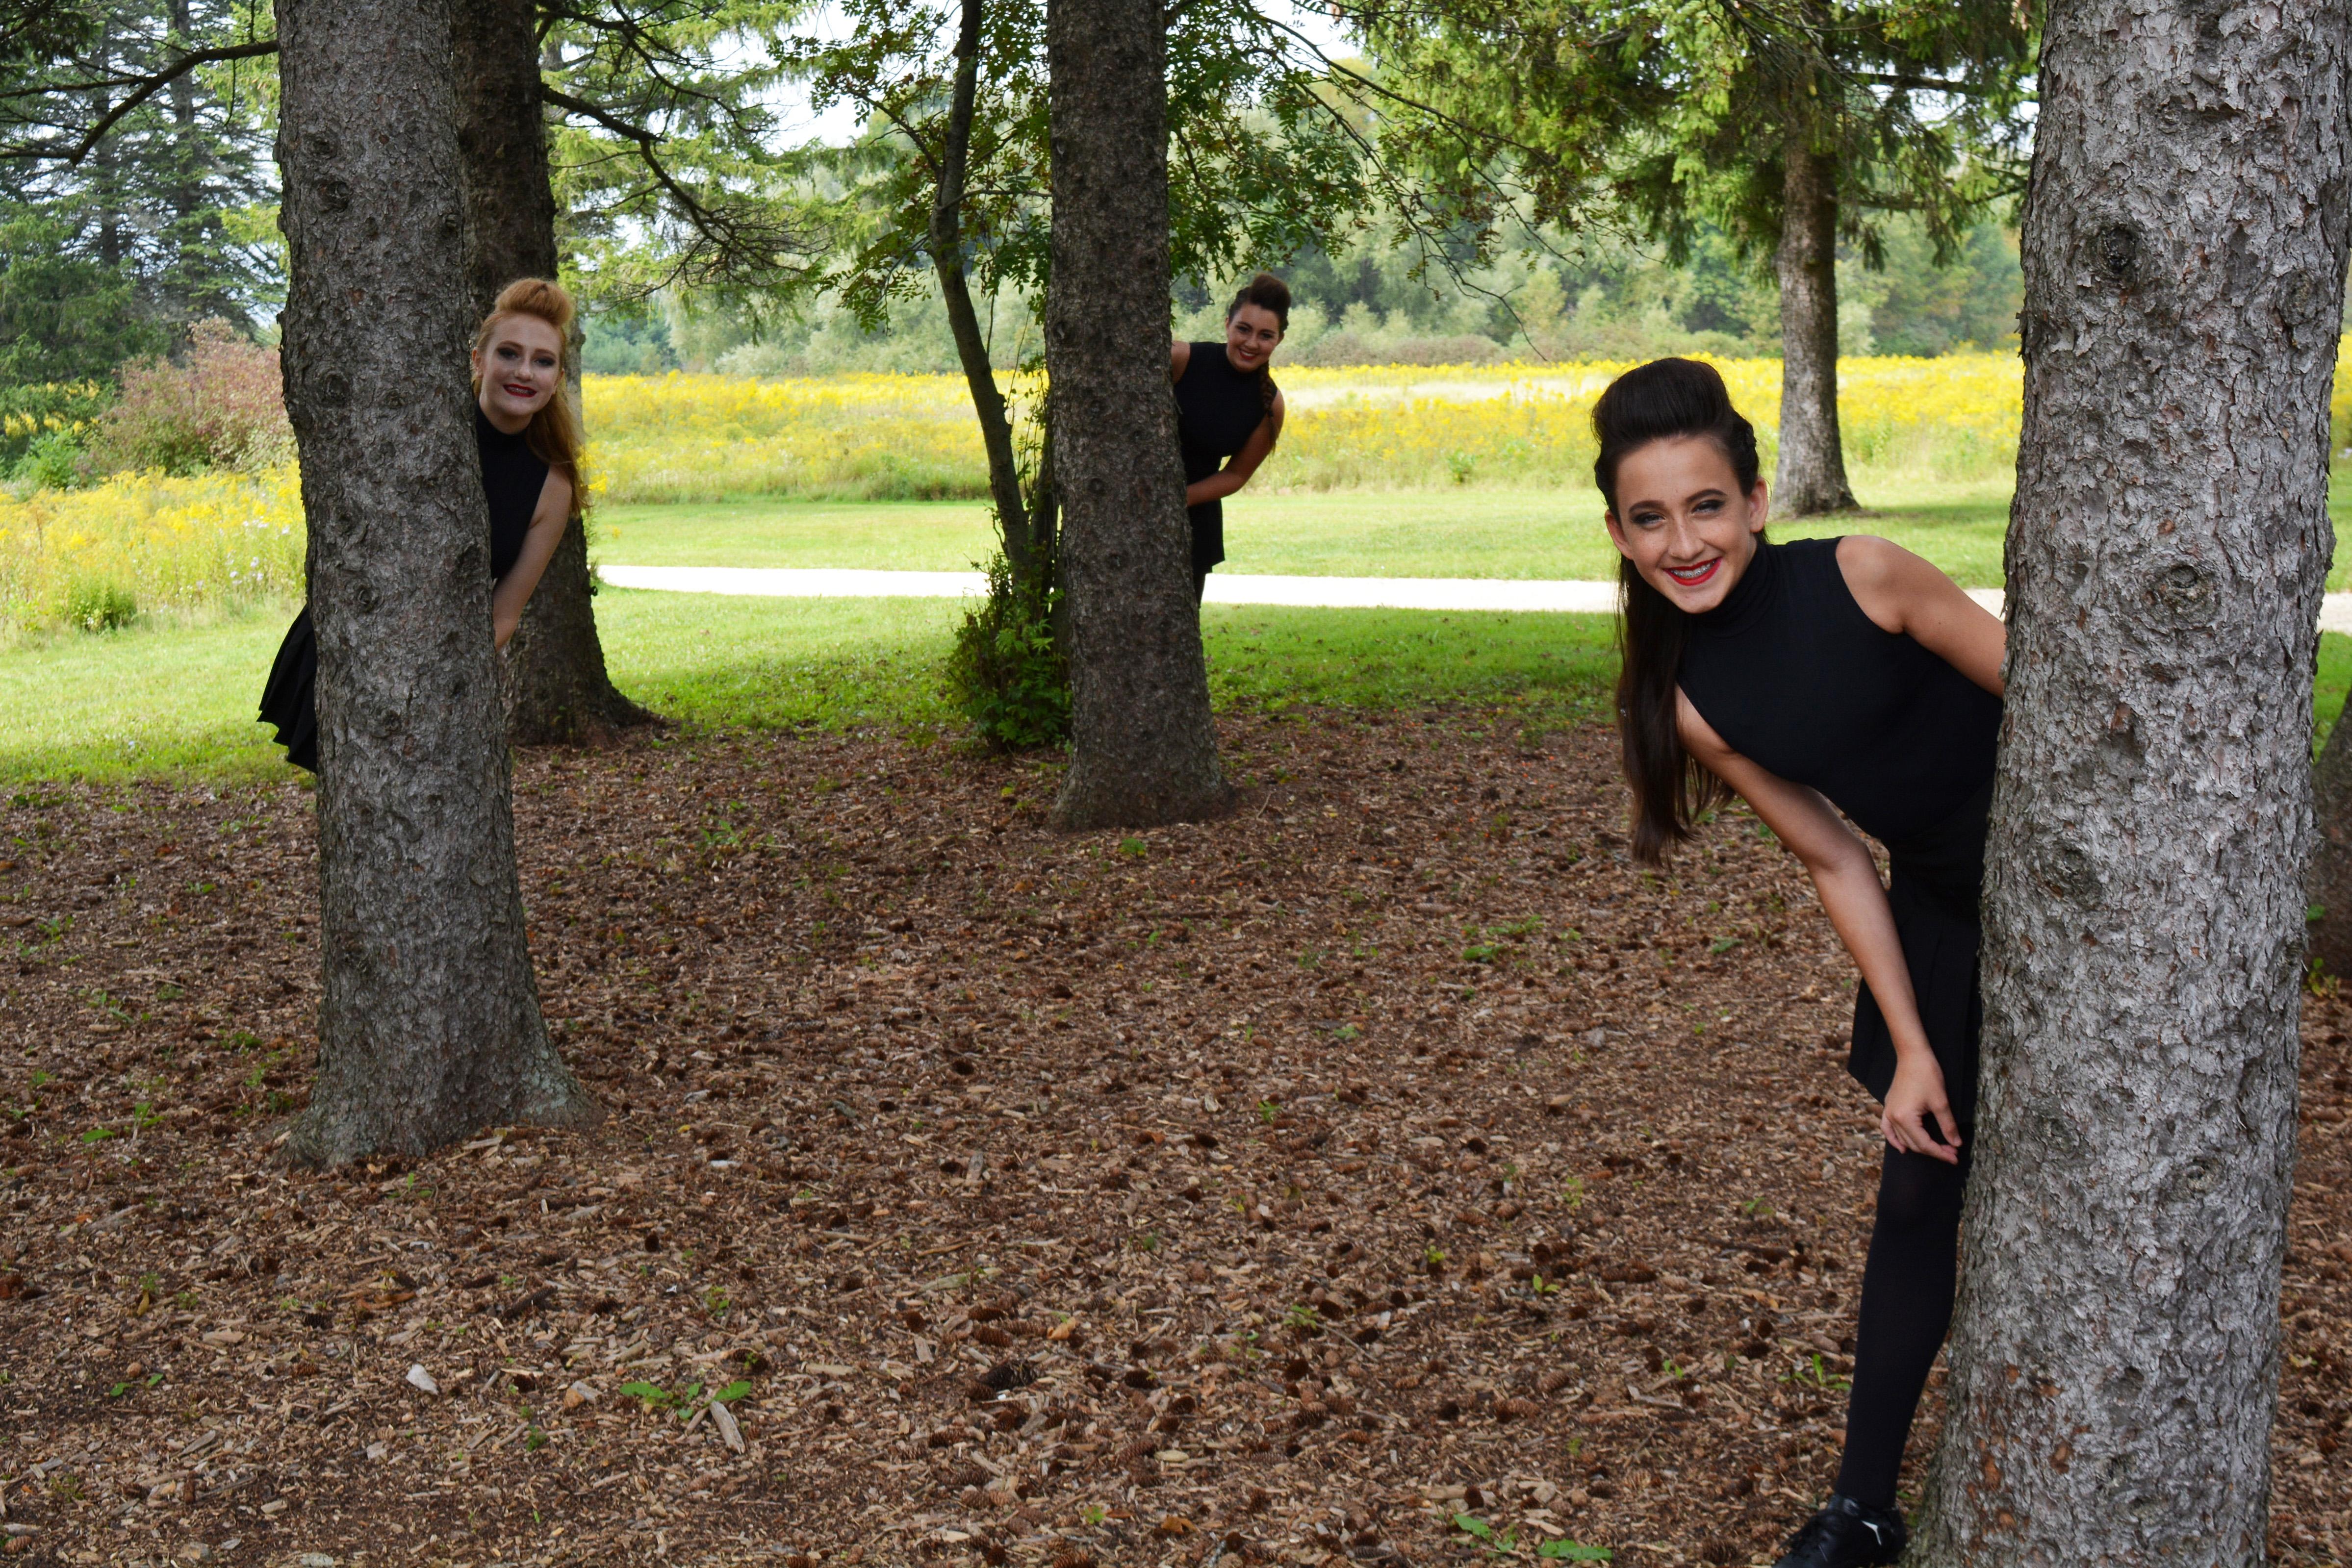 Irish Dancers in the Trees